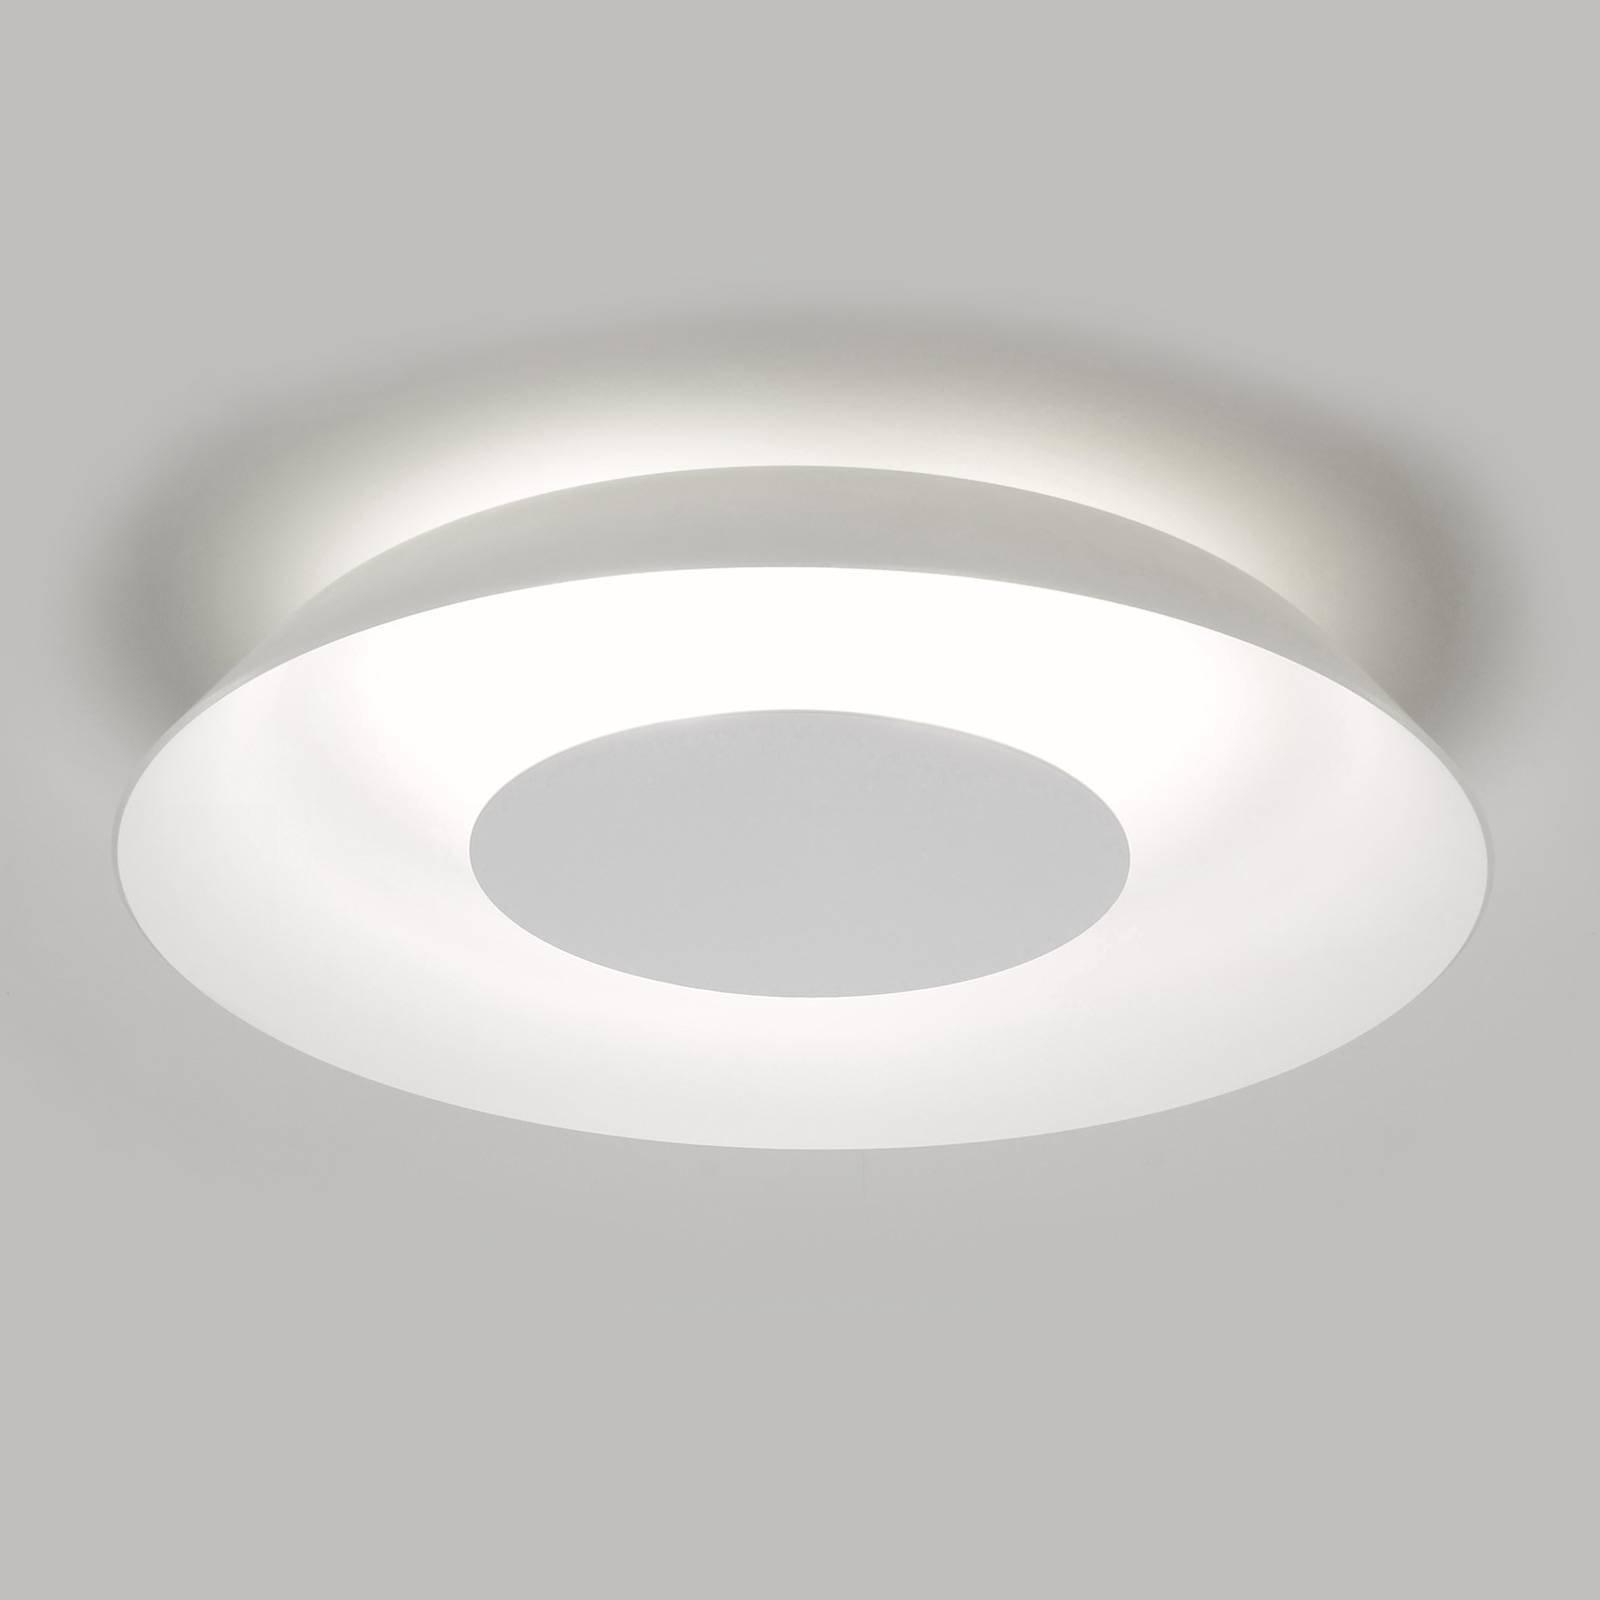 Casablanca Torno LED-taklampe Ø 50 cm